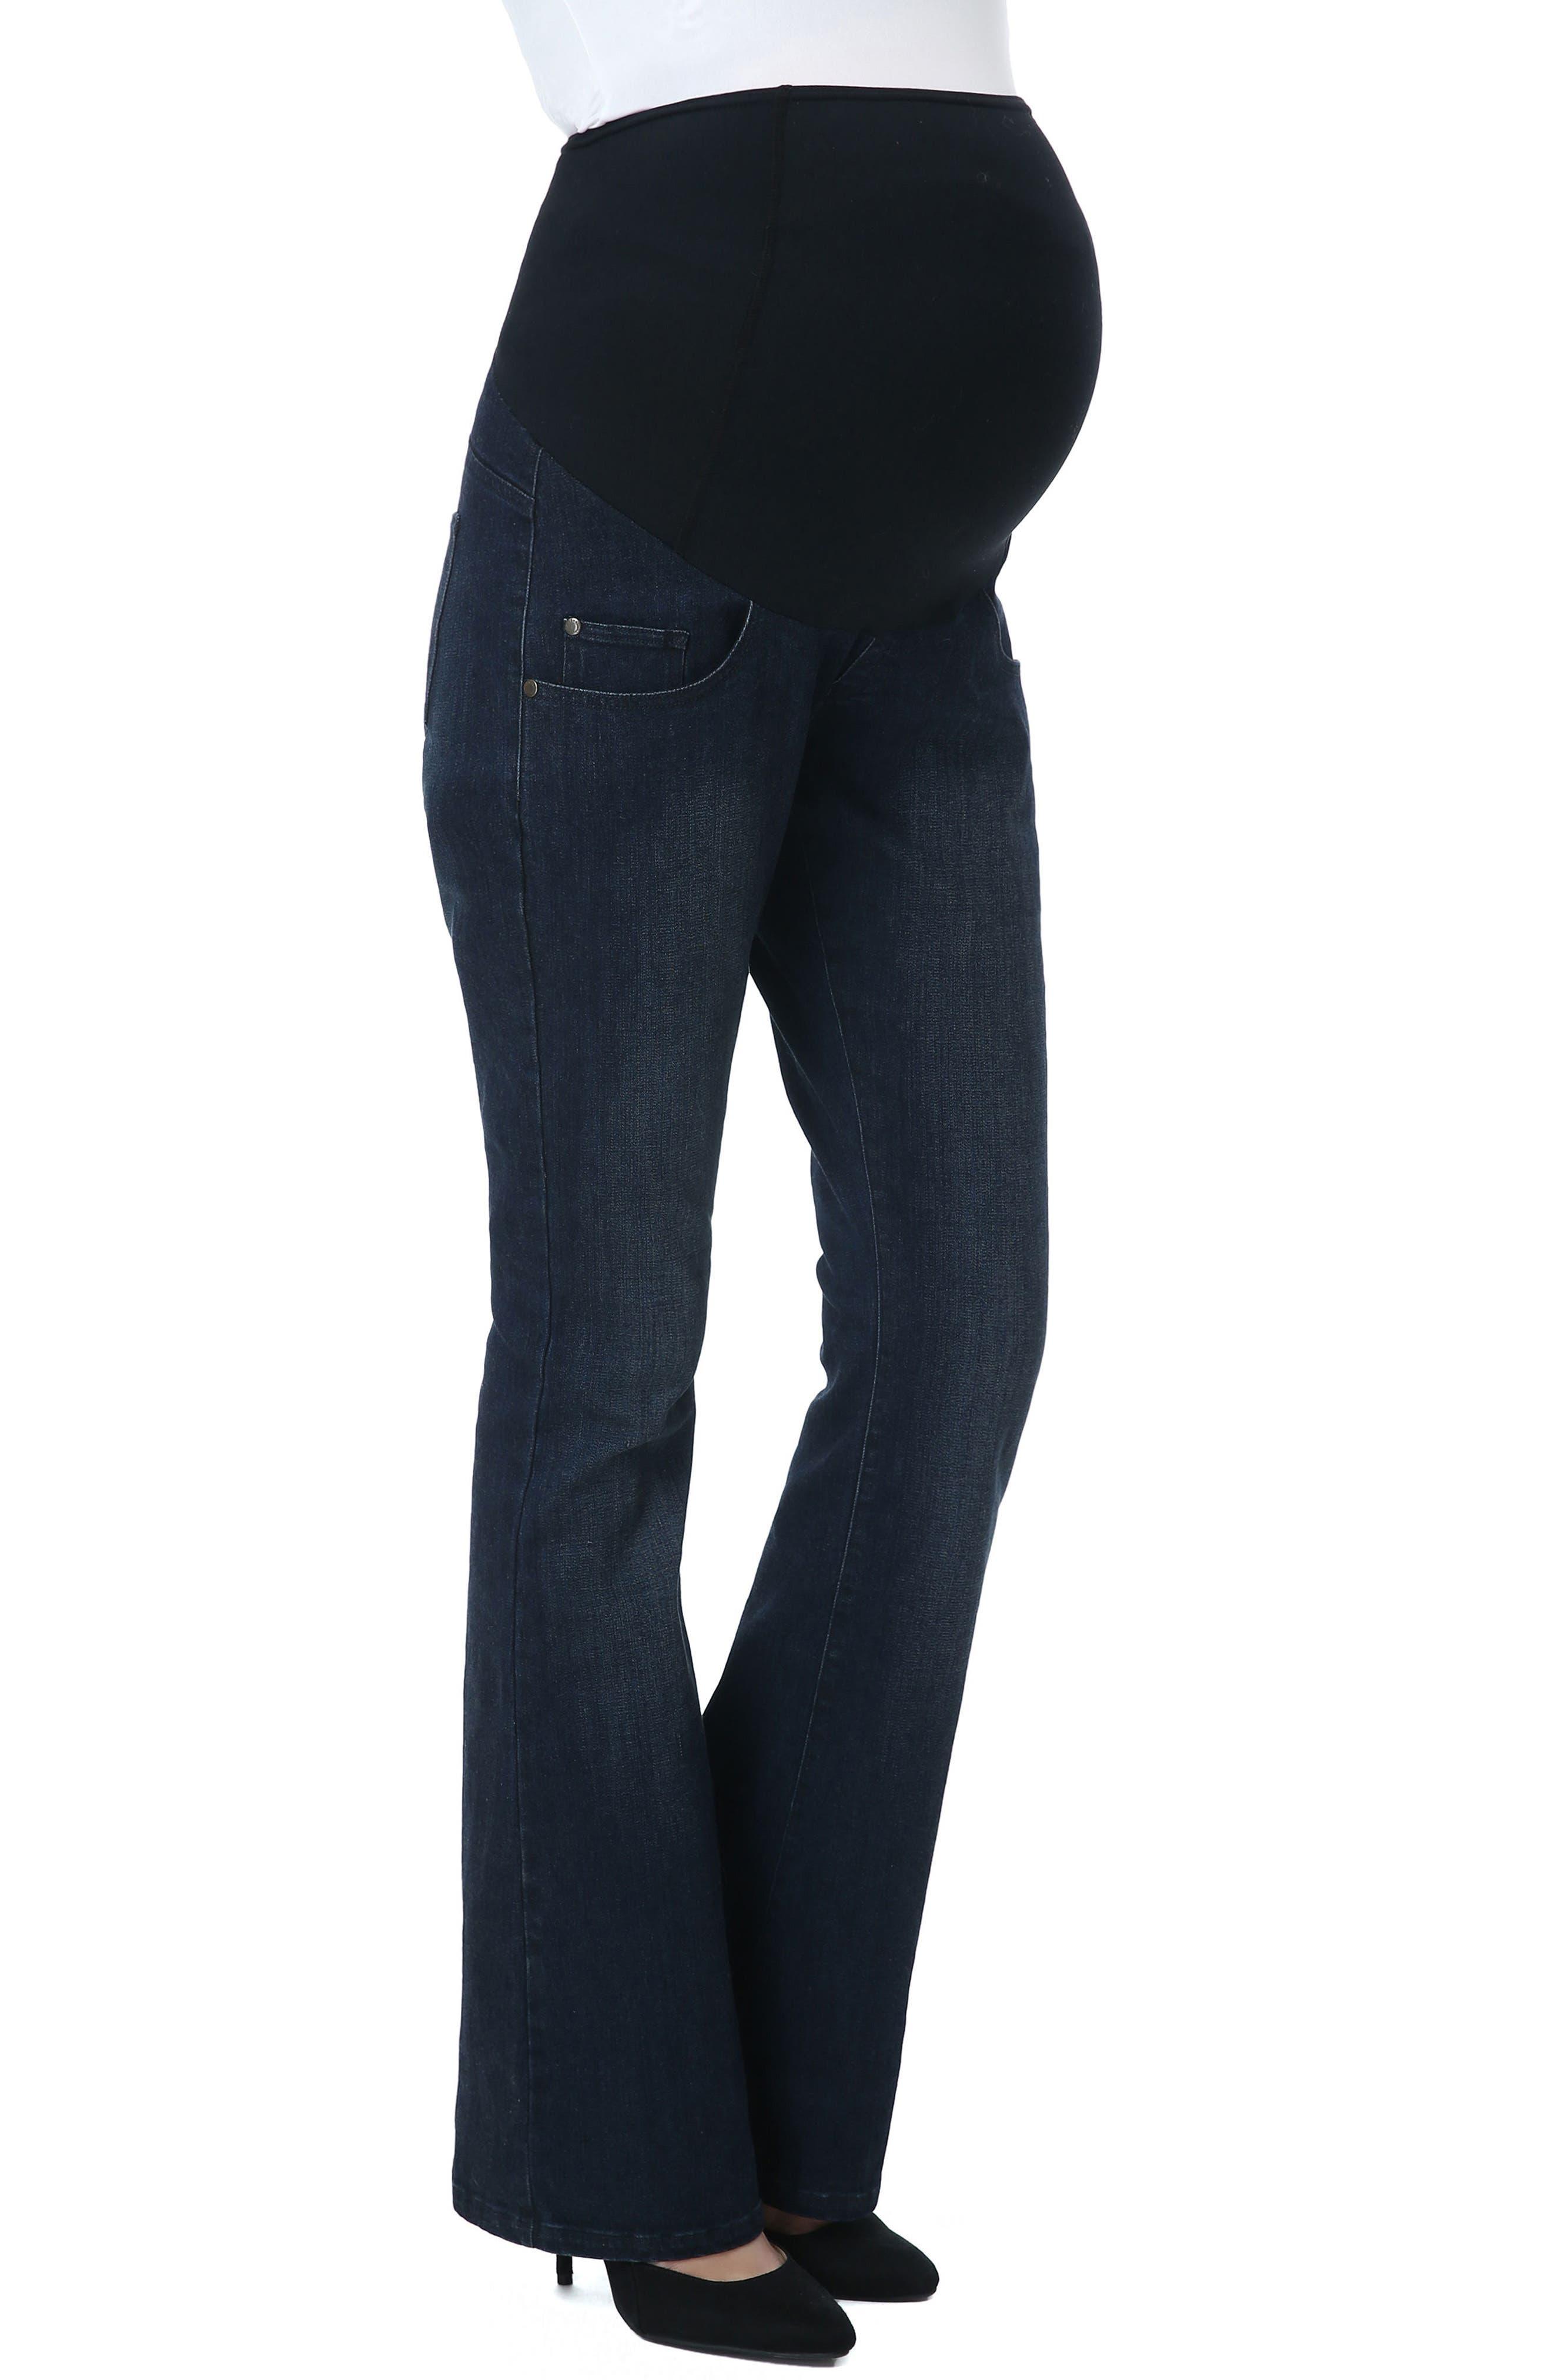 Main Image - Kimi and Kai Leni Maternity Bootcut Jeans